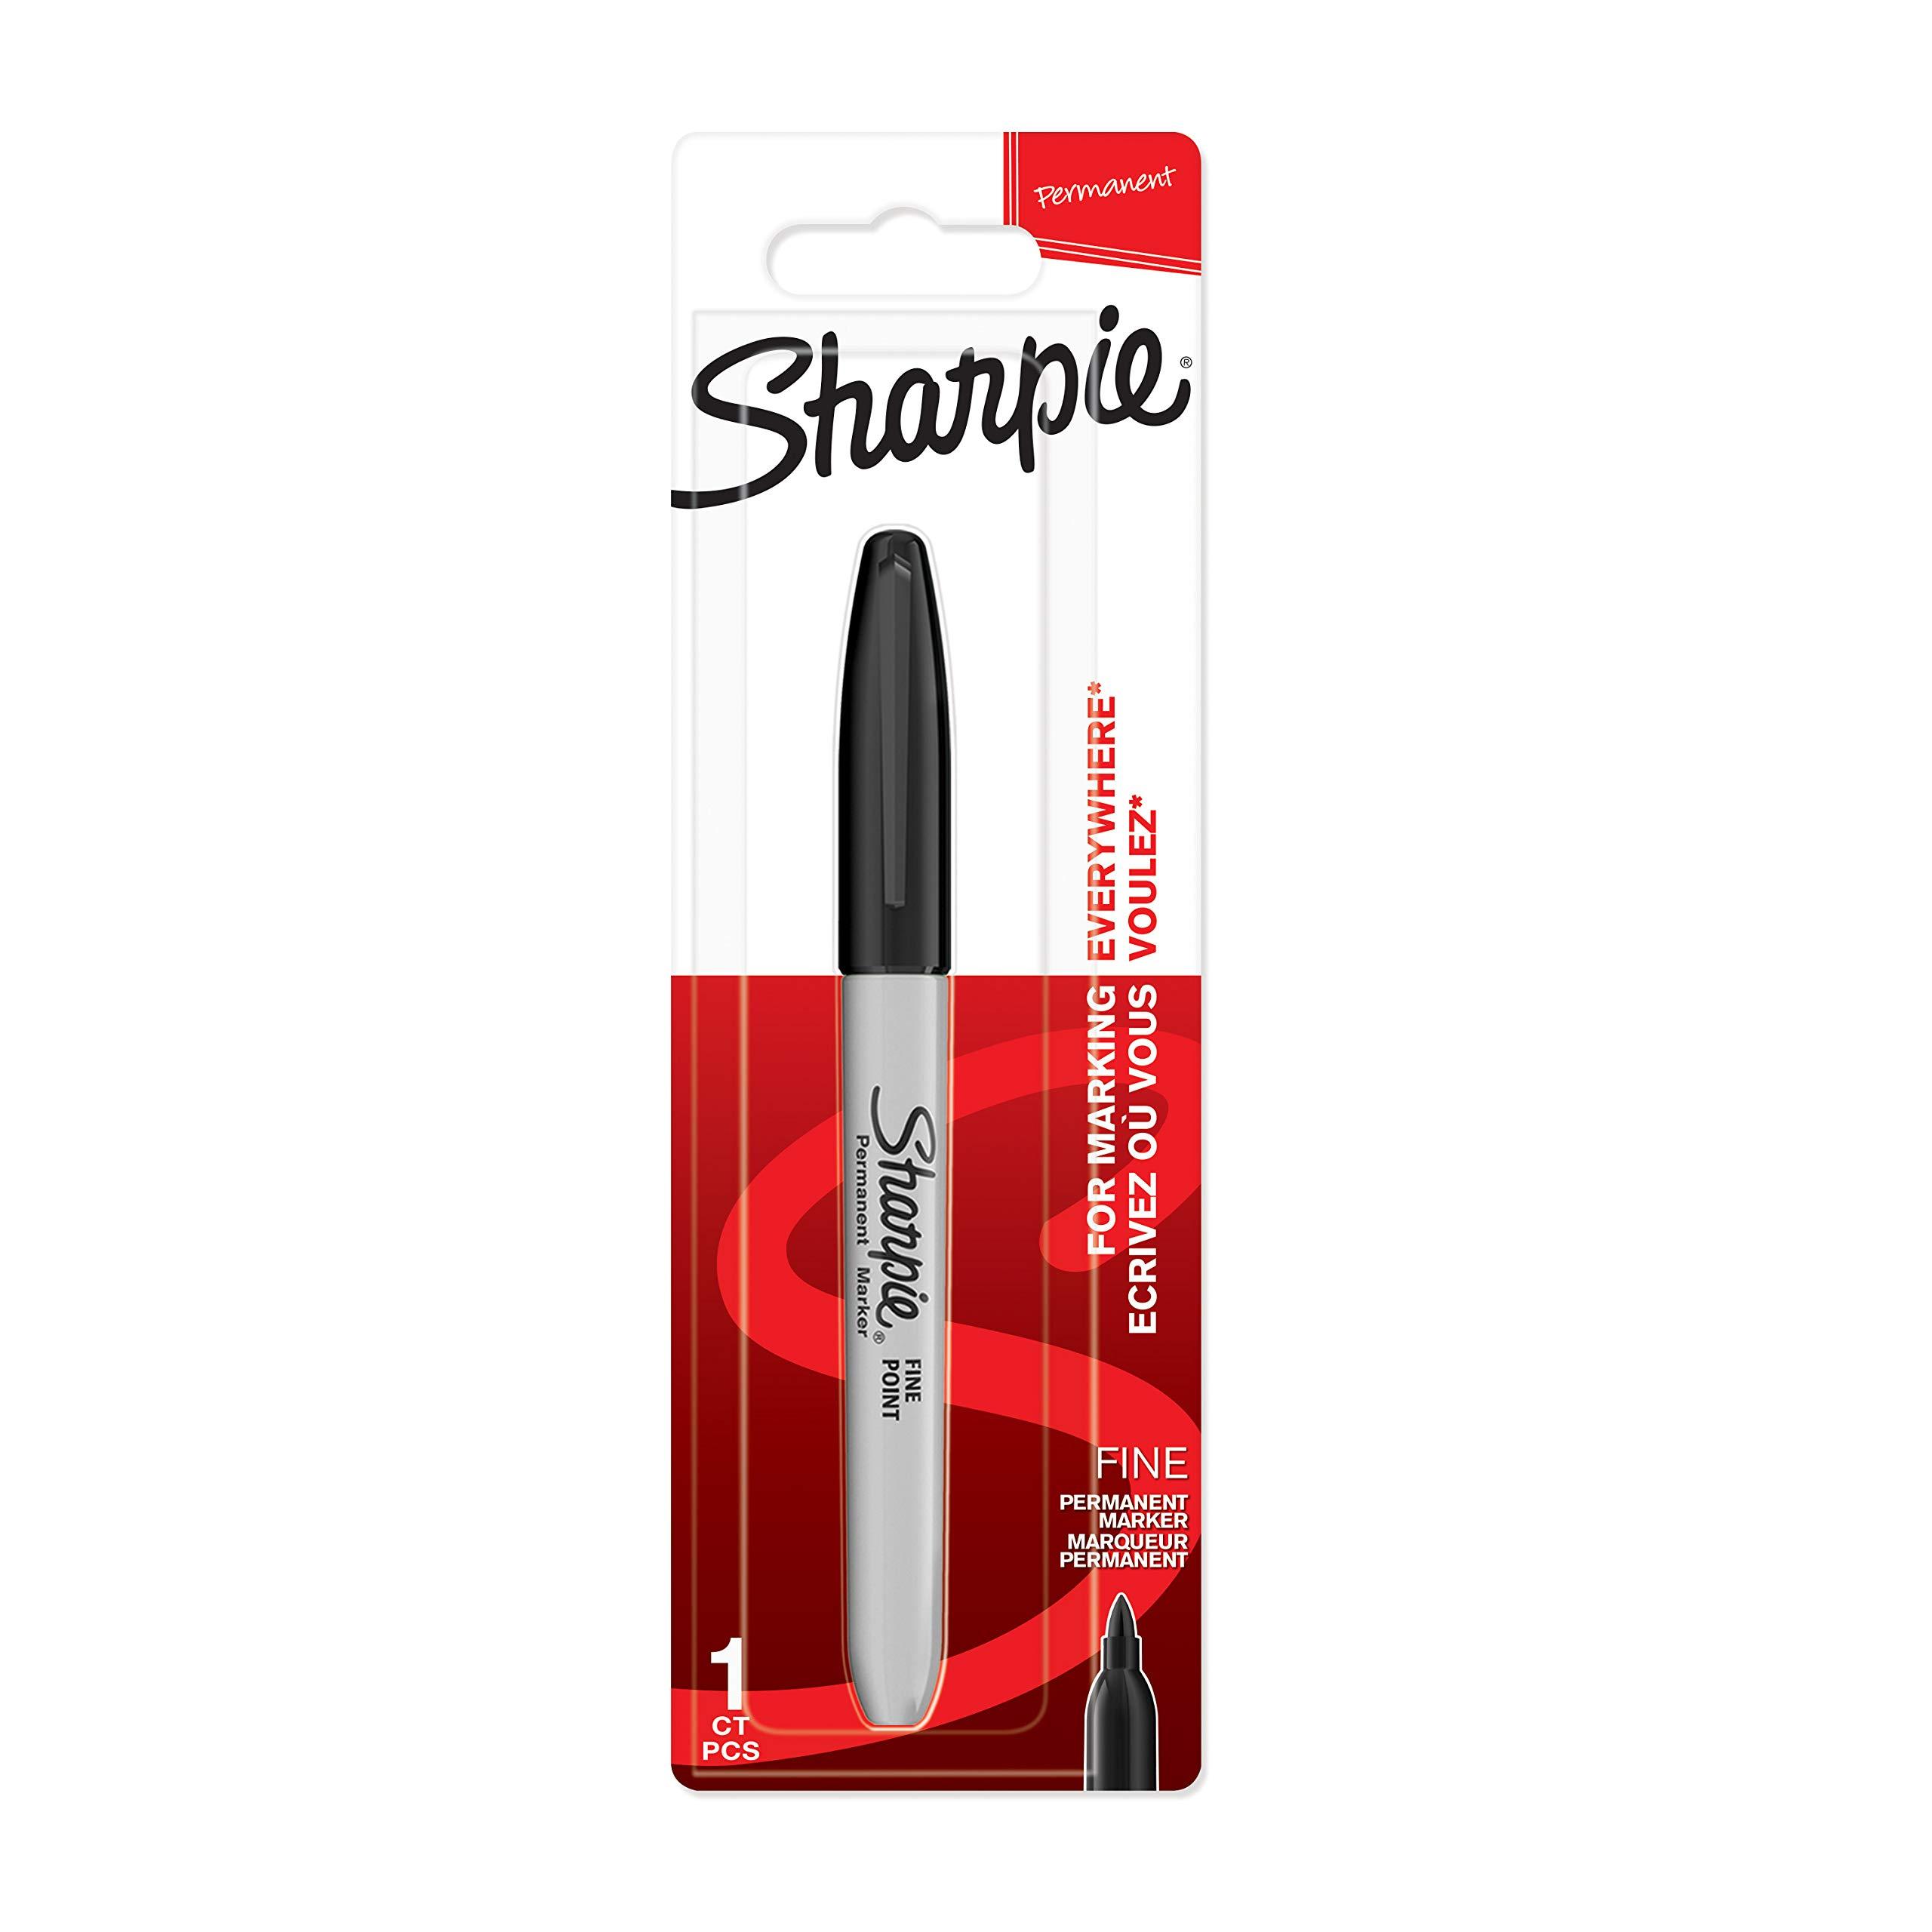 2 x Sharpie W10 Permanent Marker Black New